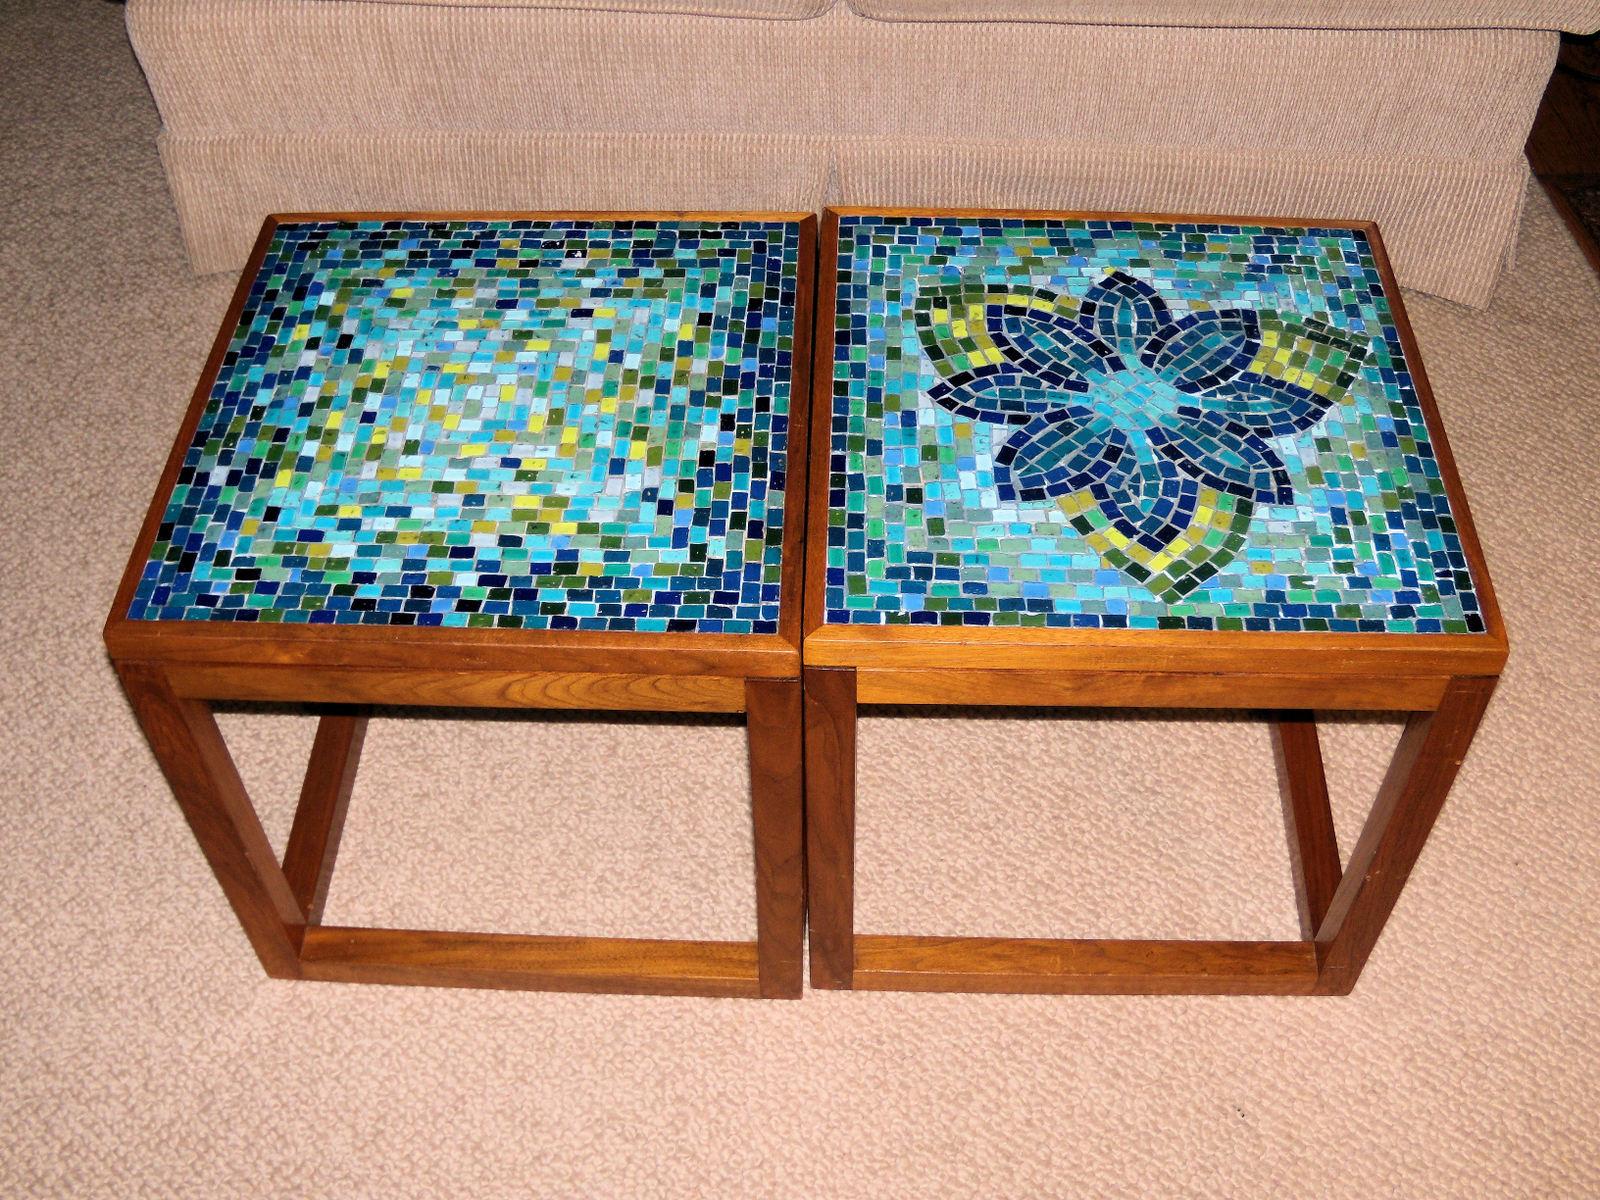 68-table 1&2.JPG